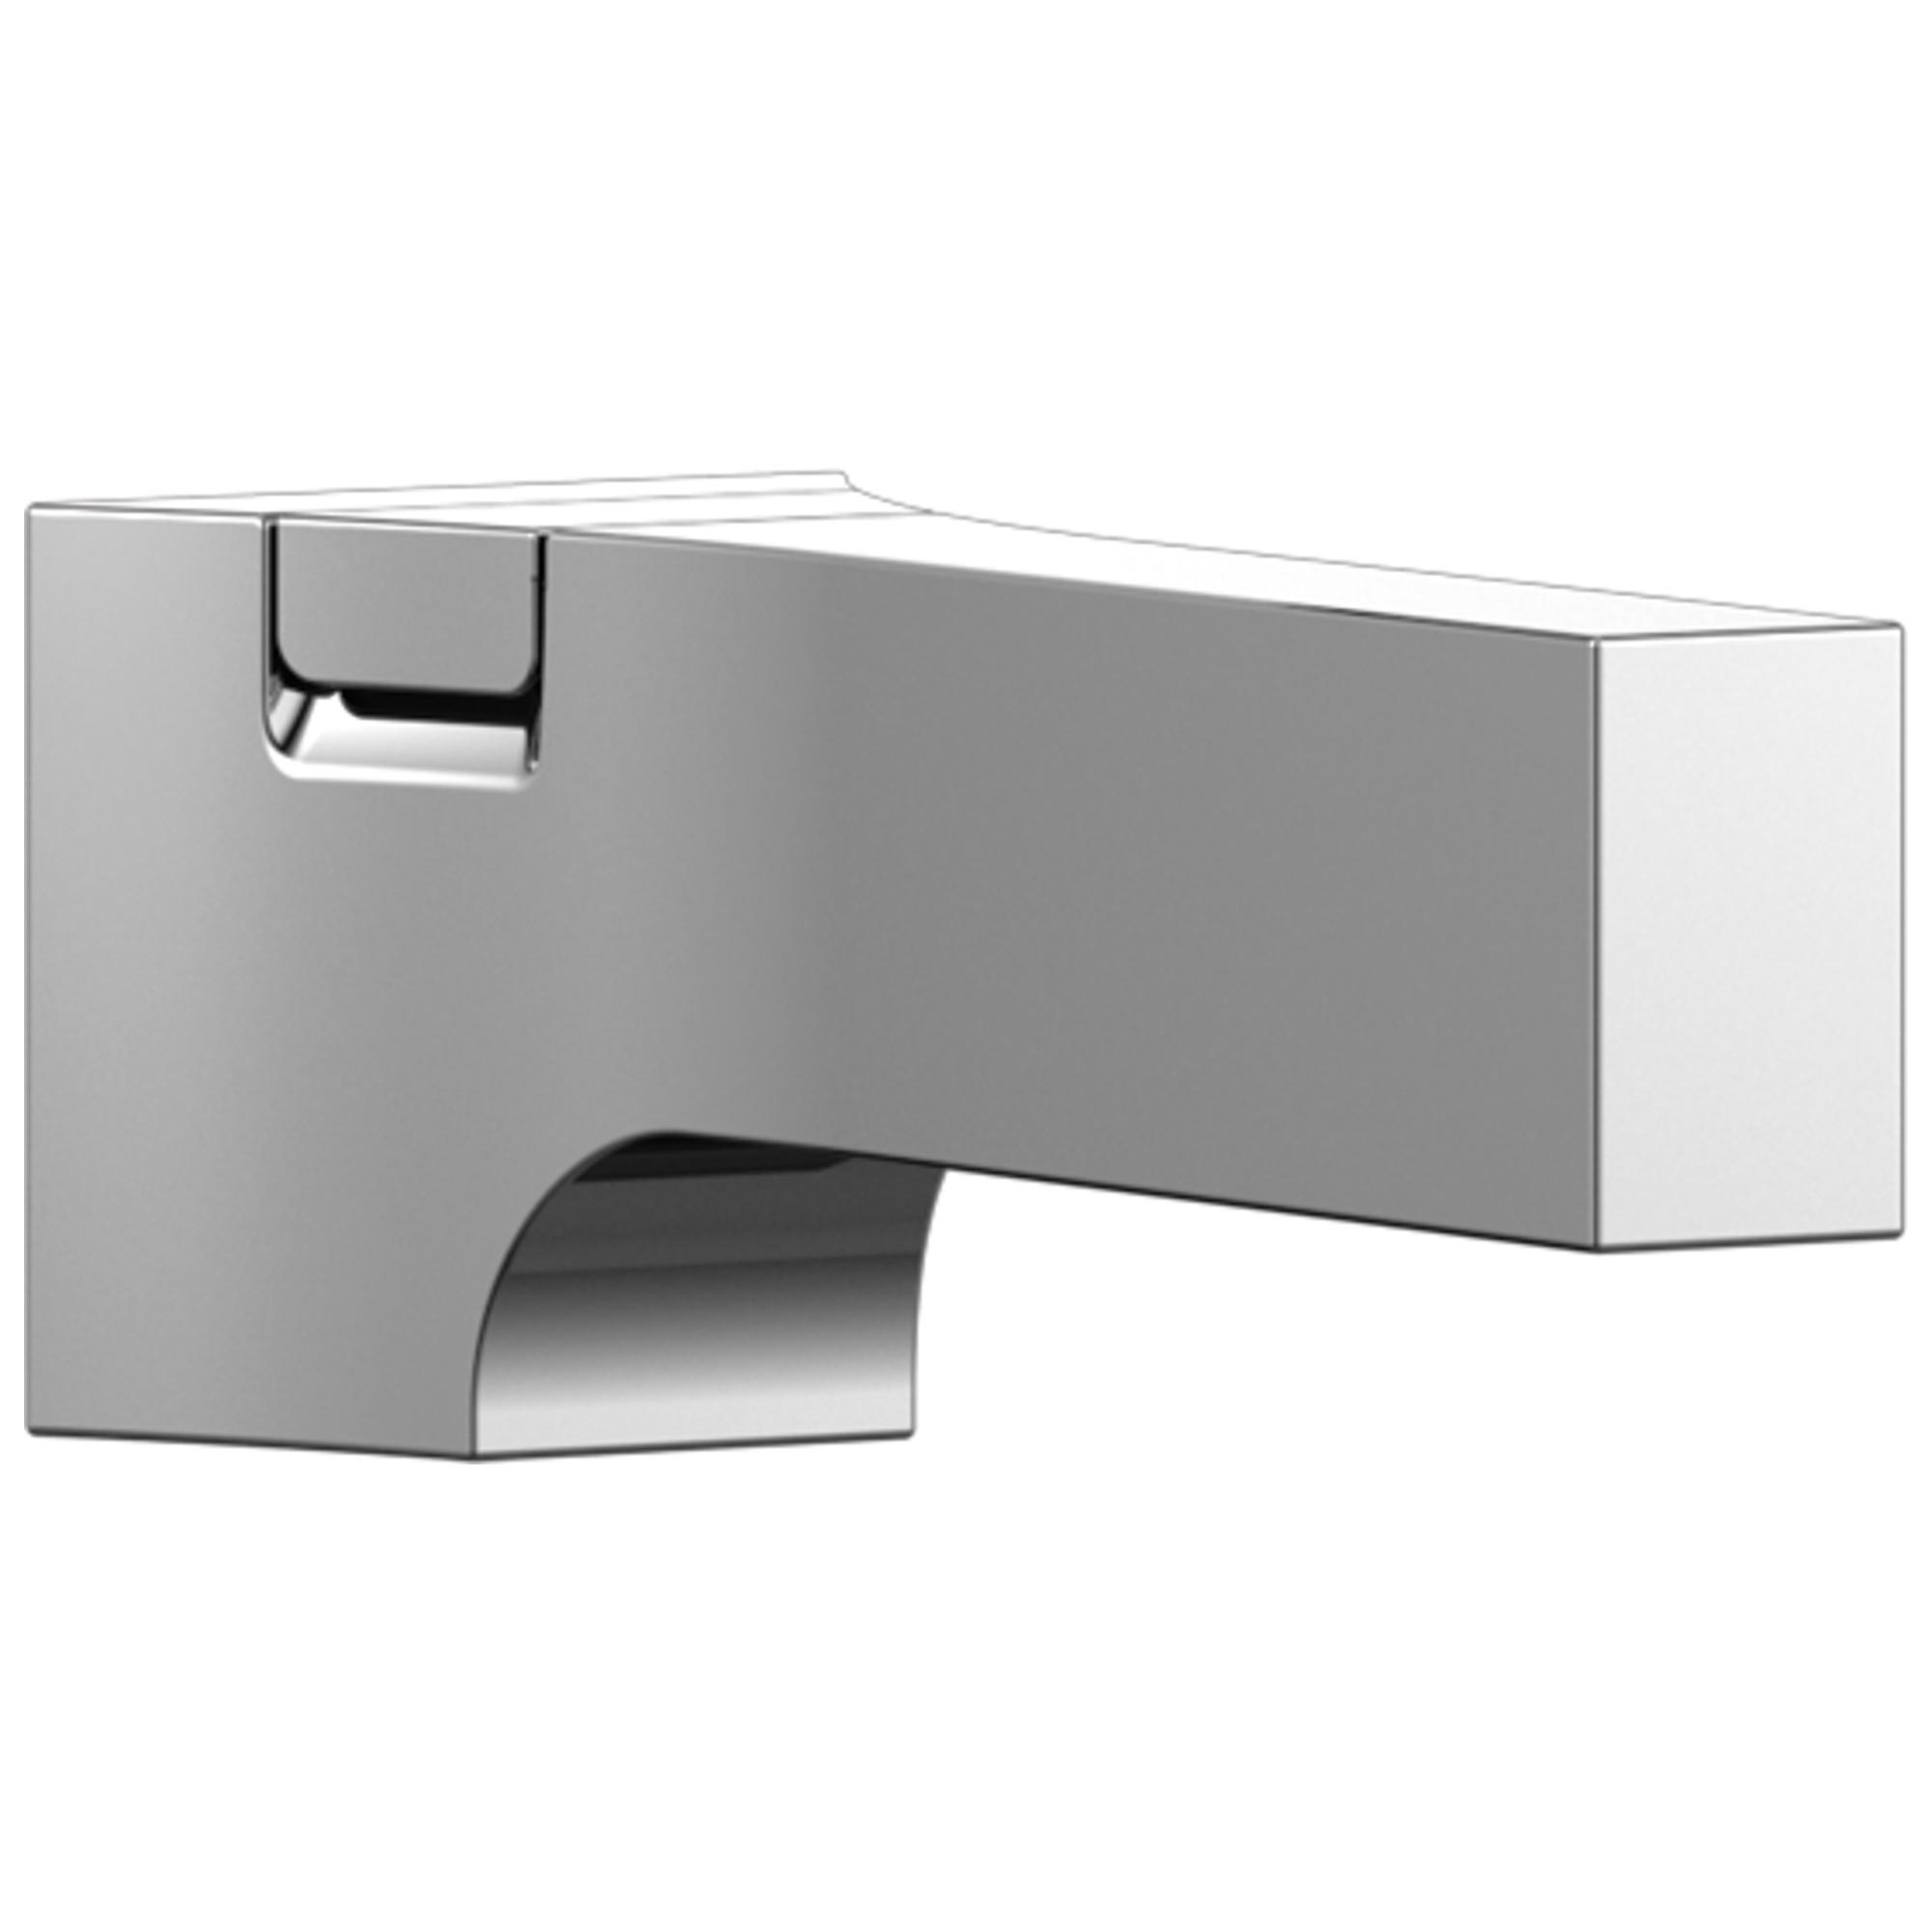 DELTA® RP84412 Zura™ Diverter Tub Spout, Chrome Plated